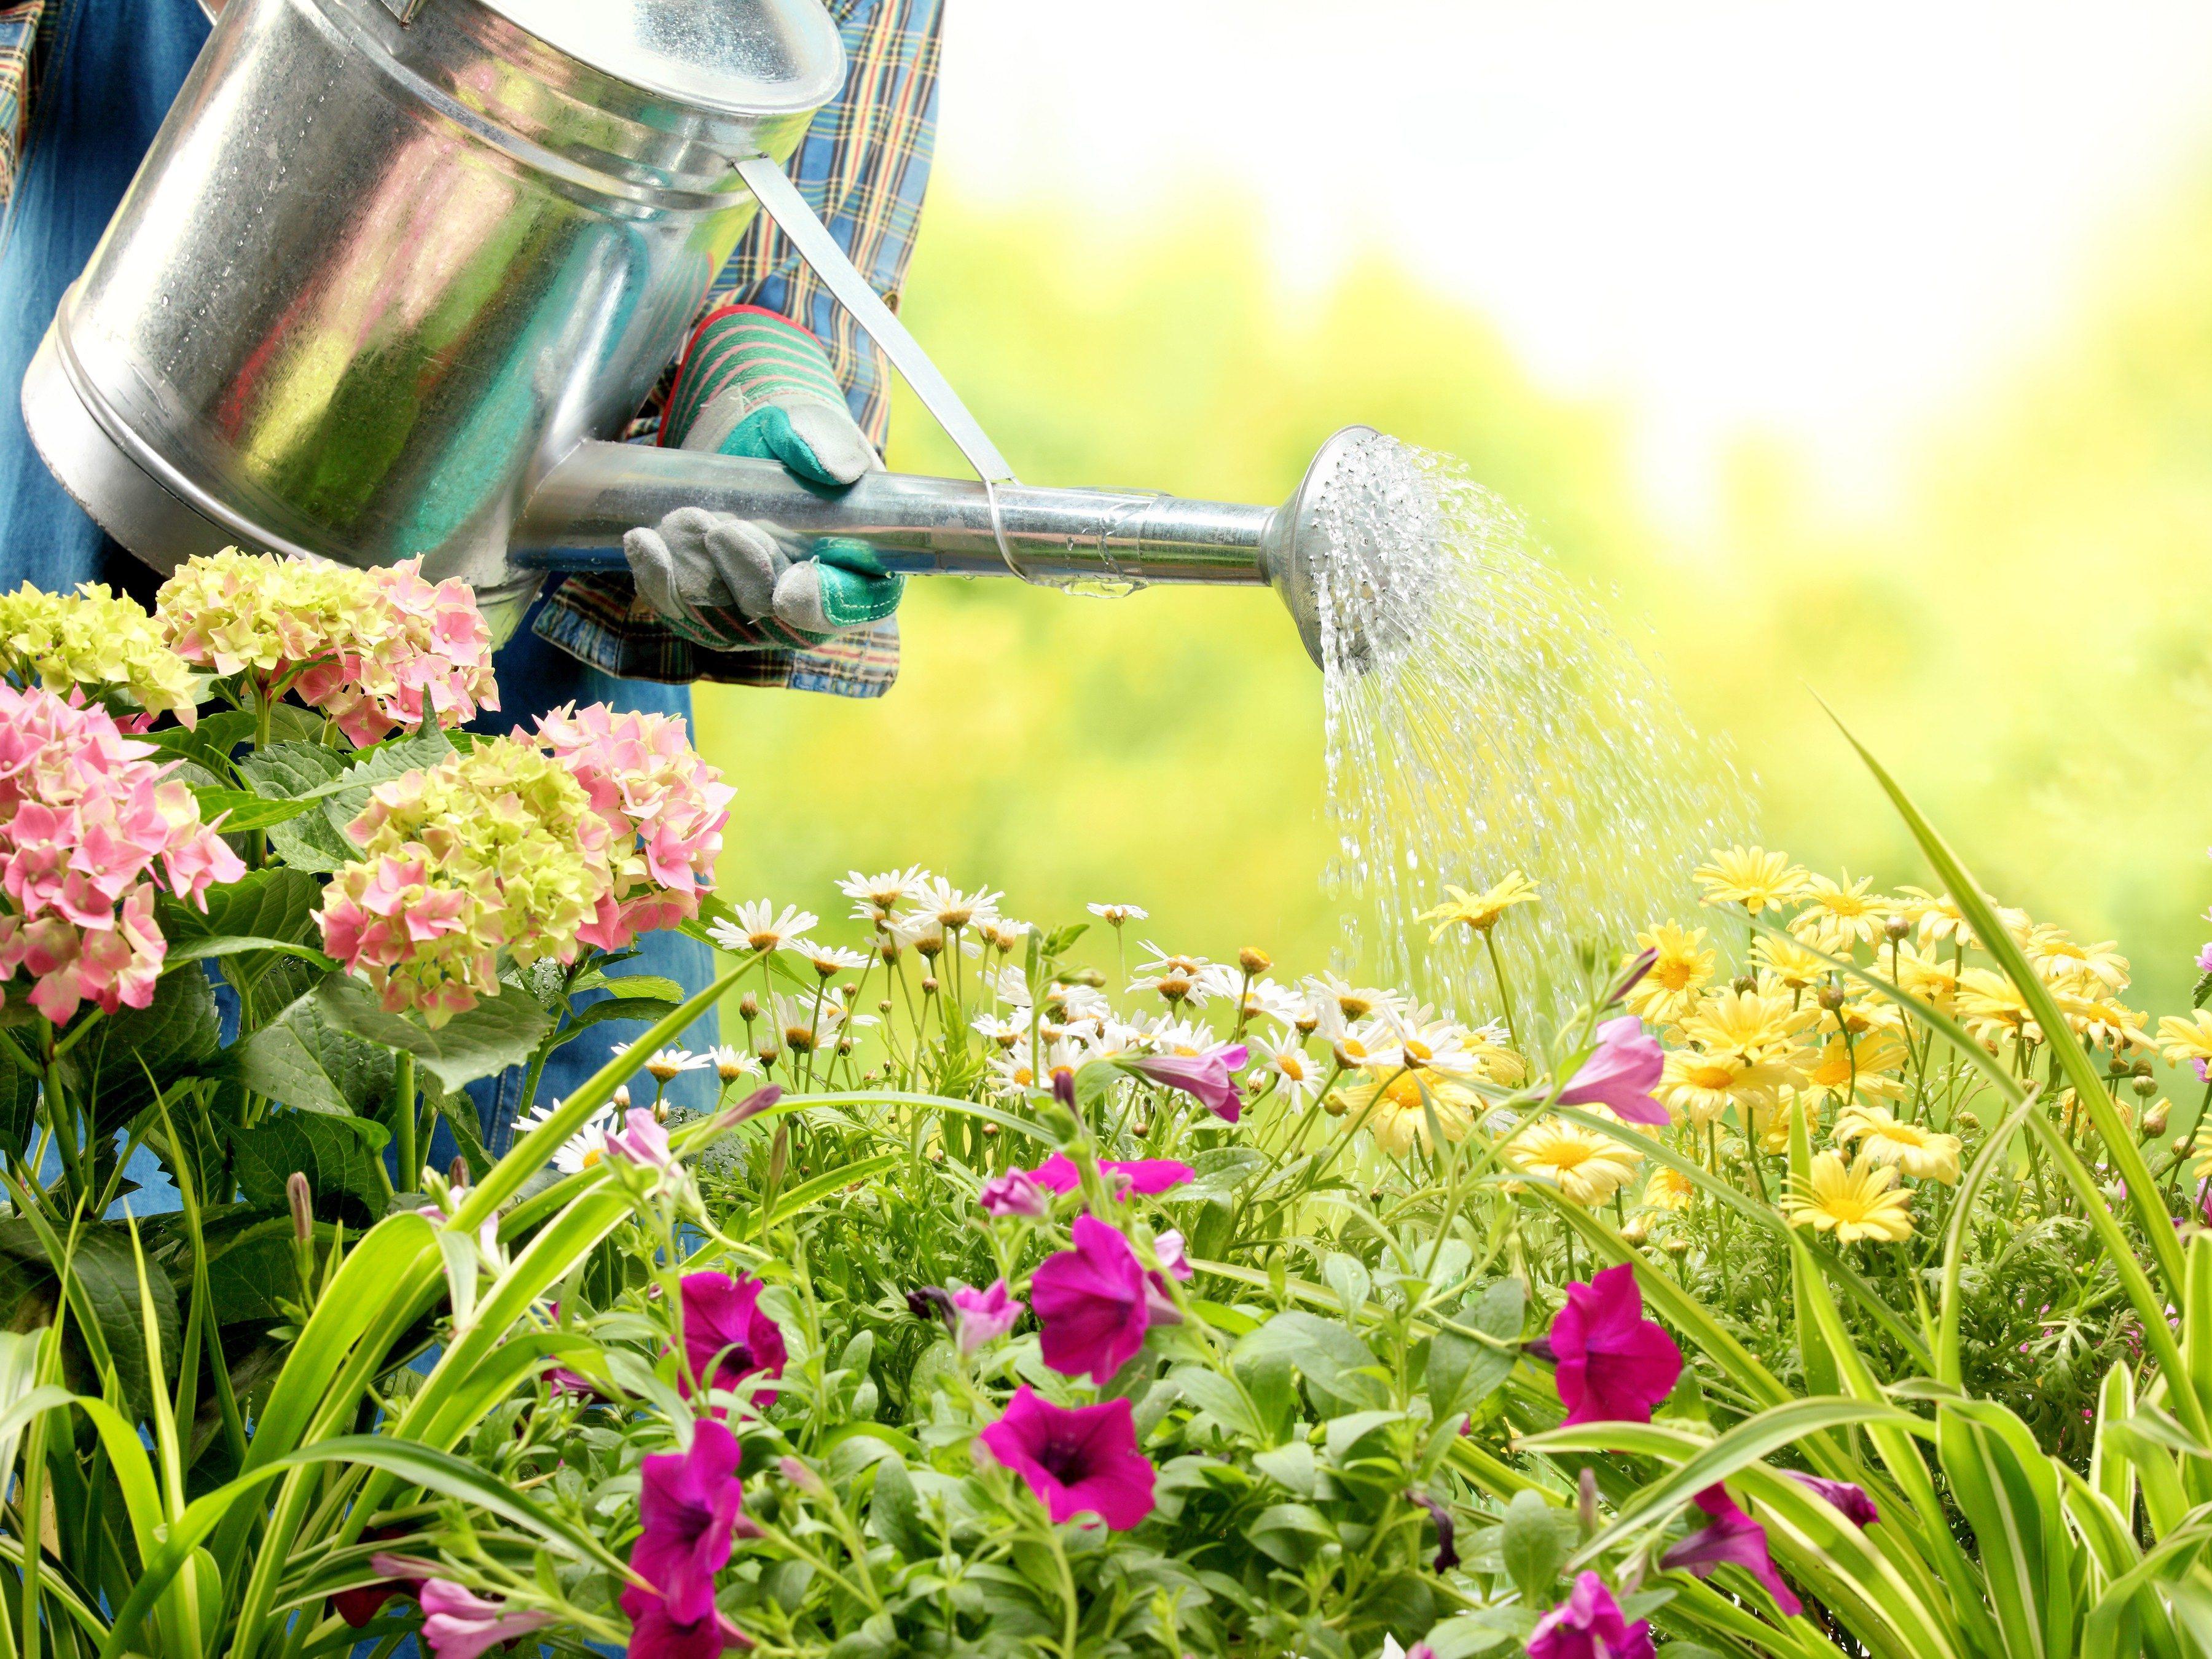 Perfect Garden Step 1: Make a Plan